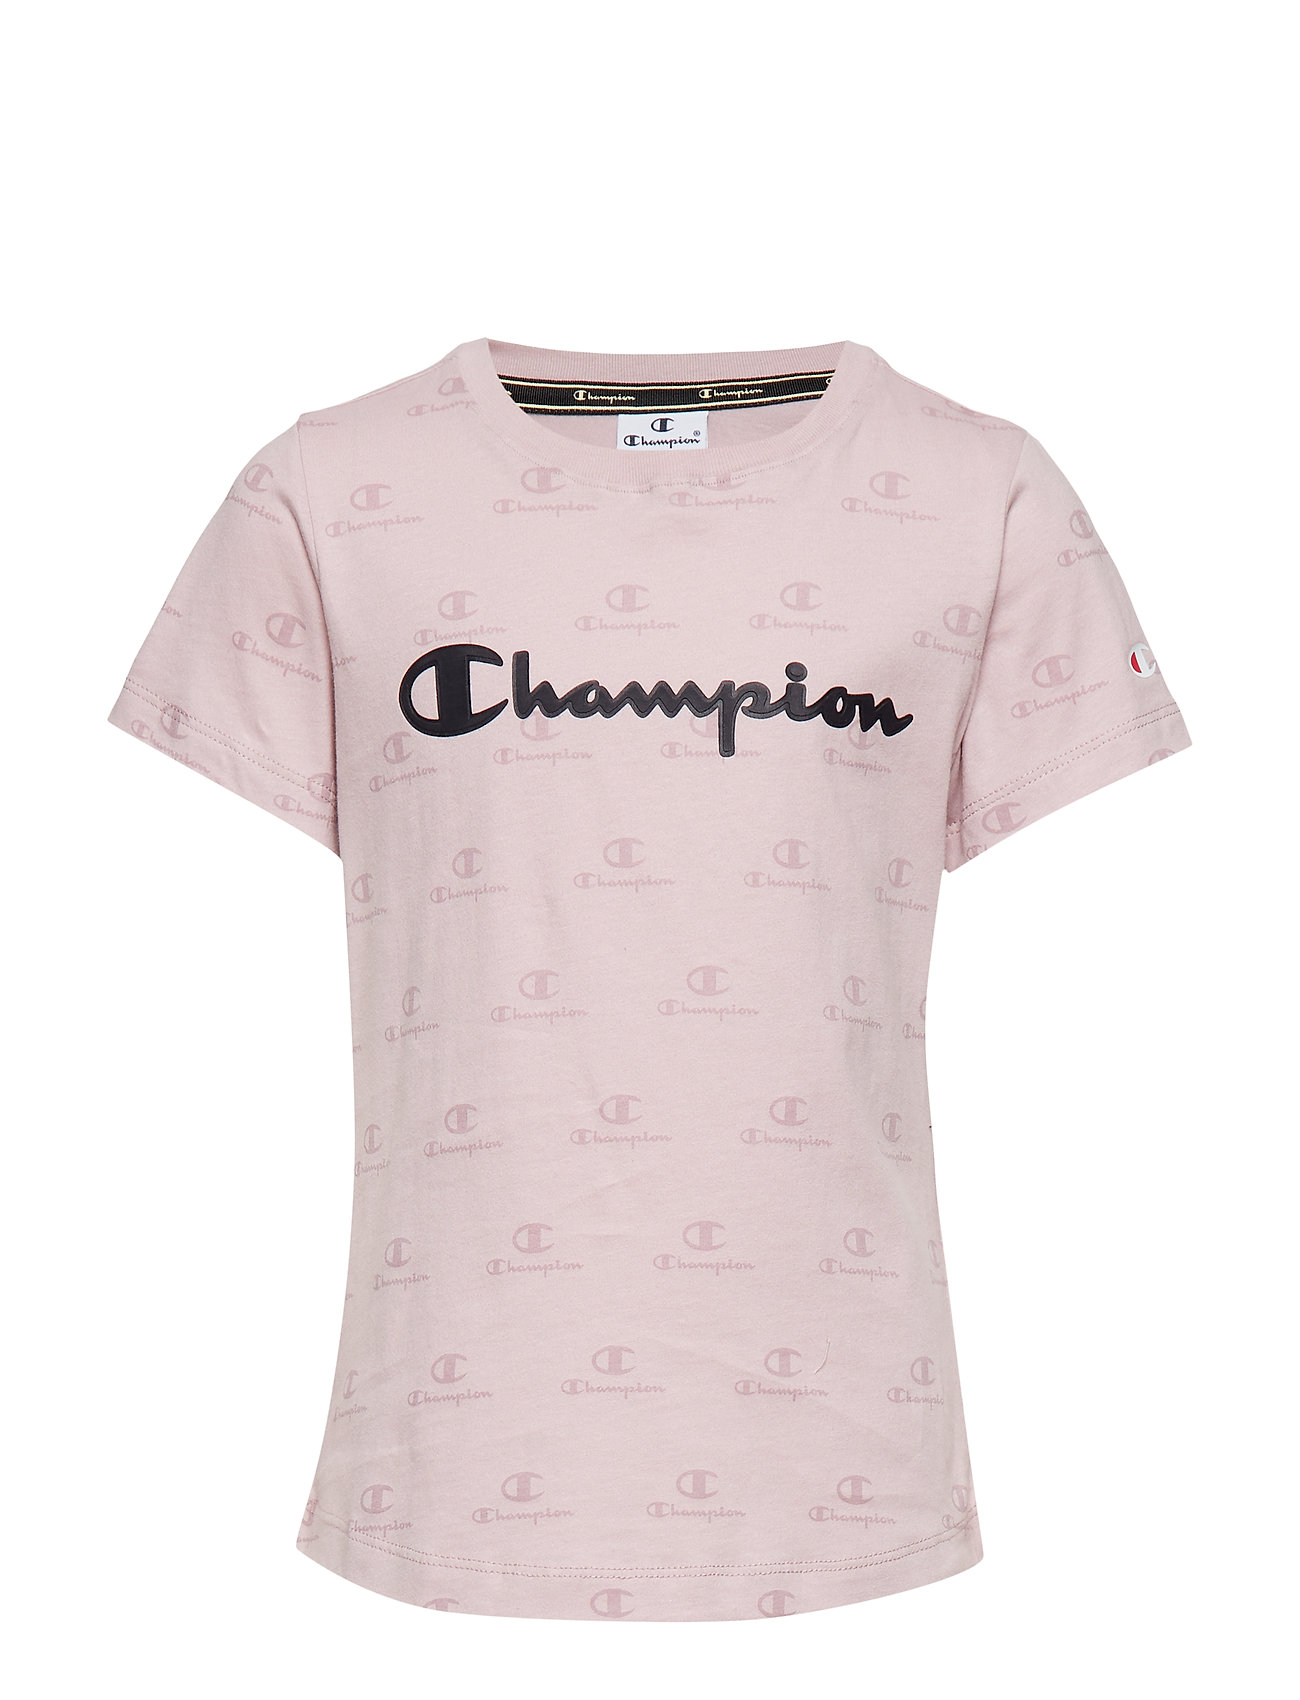 Champion Crewneck T-Shirt - VIOLET ICE AL (VIT) A